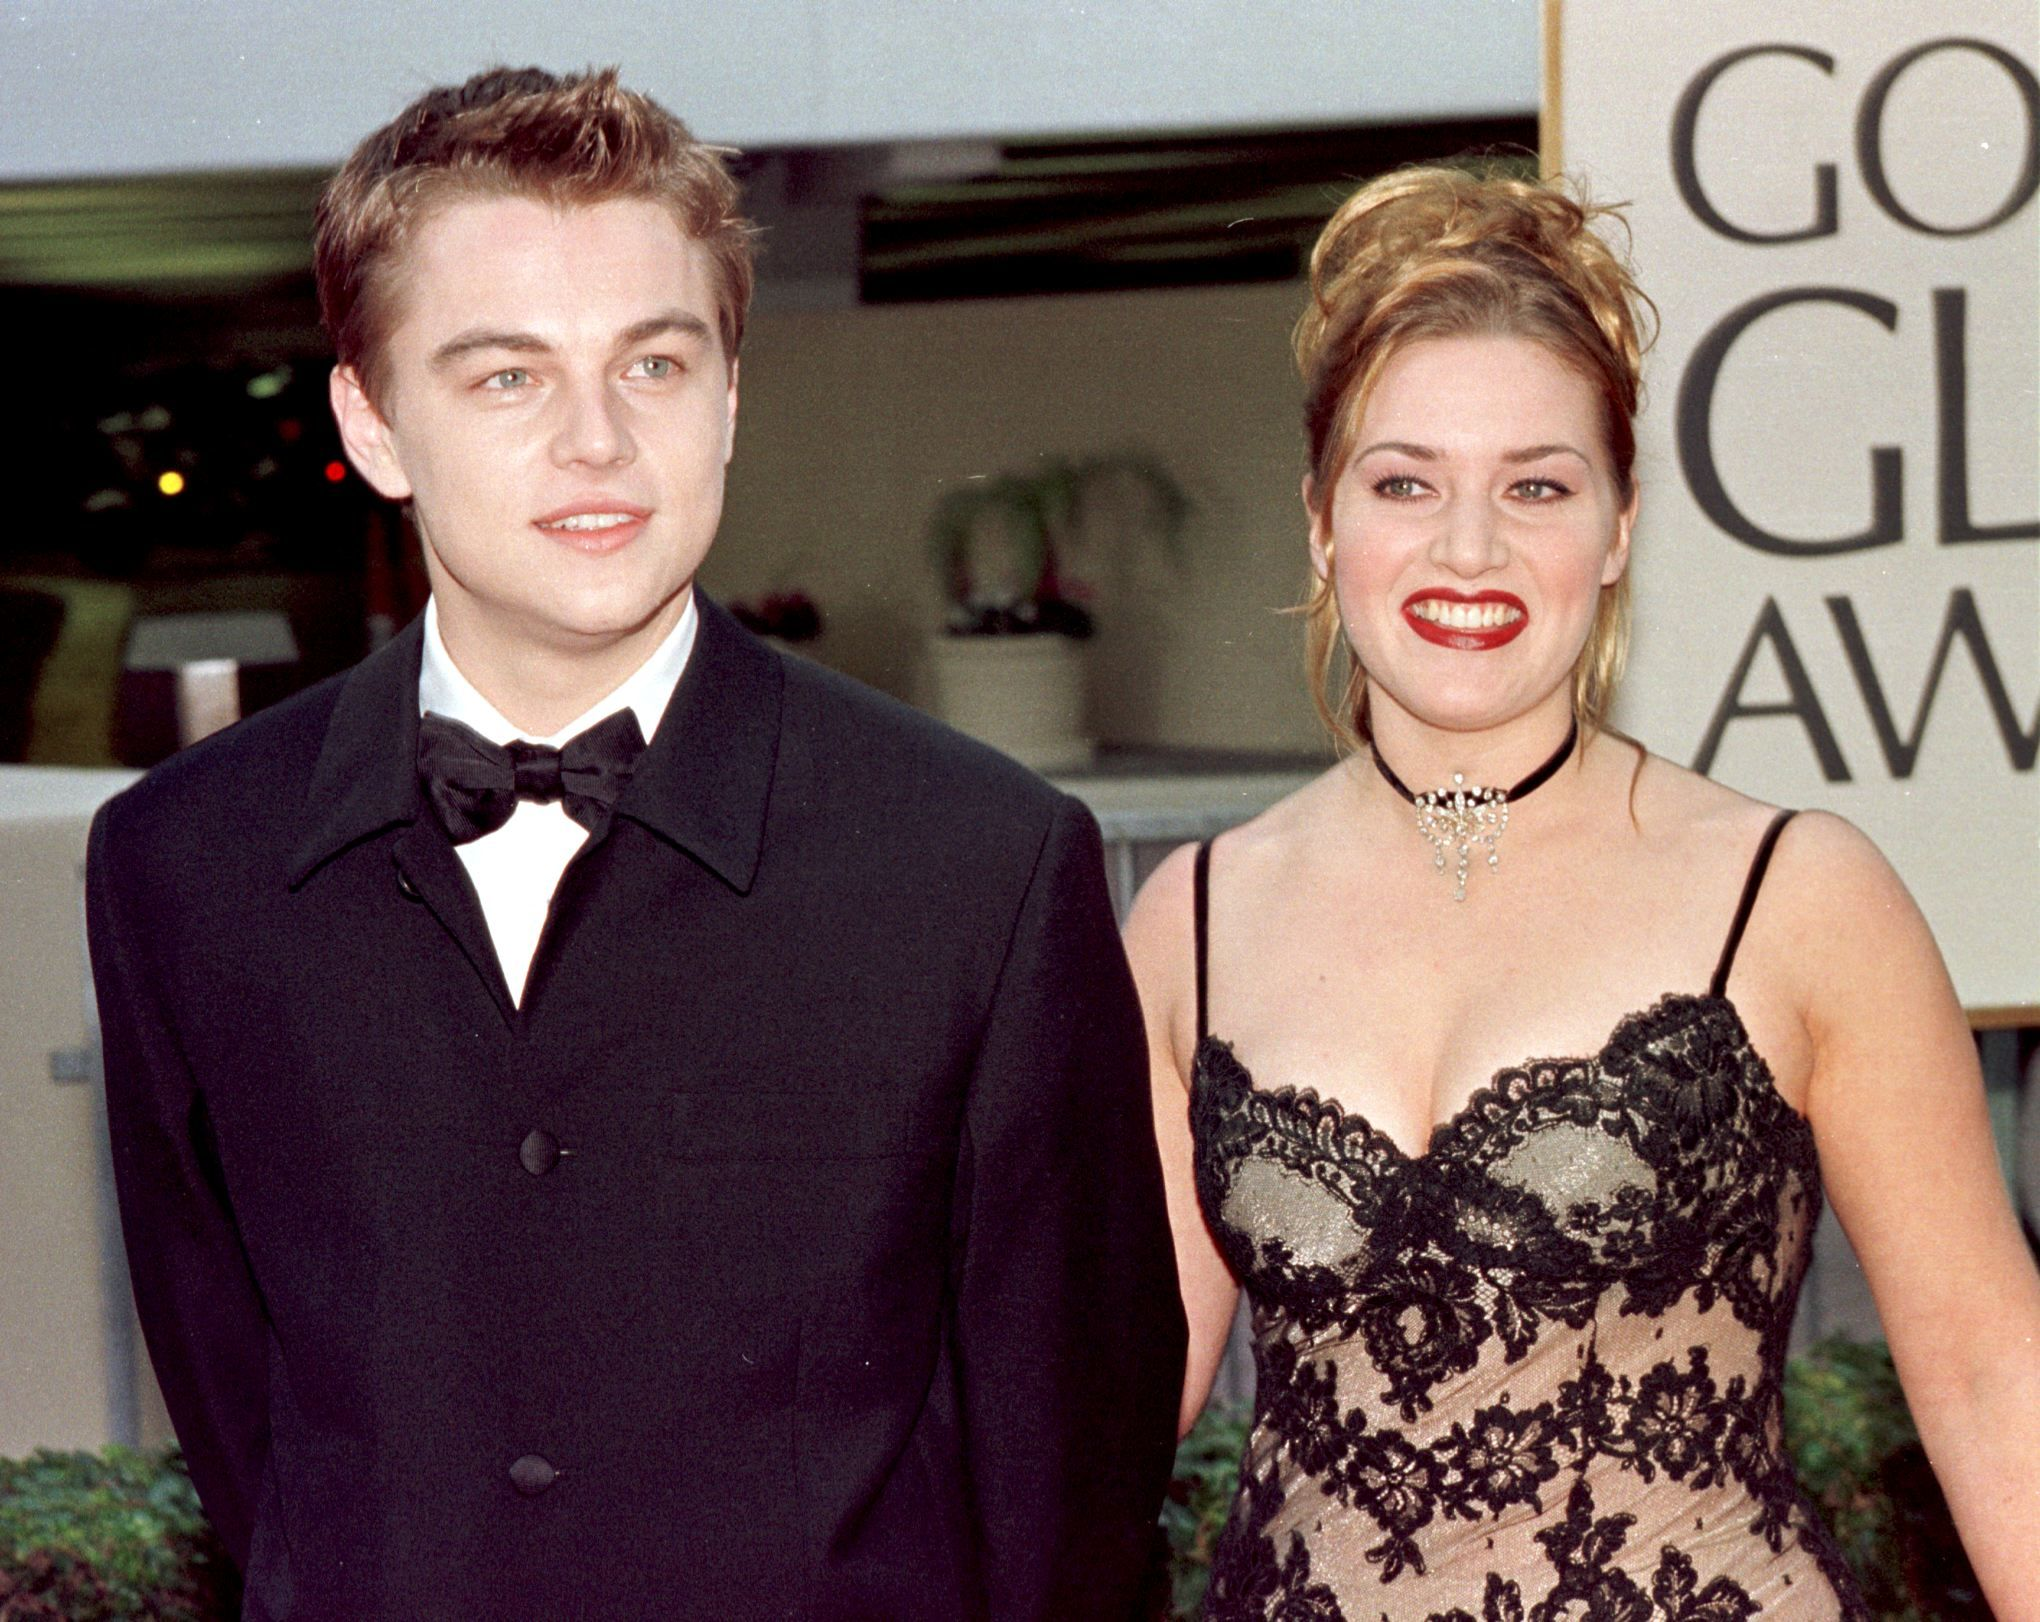 Leonardo Dicaprio And Kate Winslet S Friendship History Of Leonardo Dicaprio And Kate Winslet S Friendship